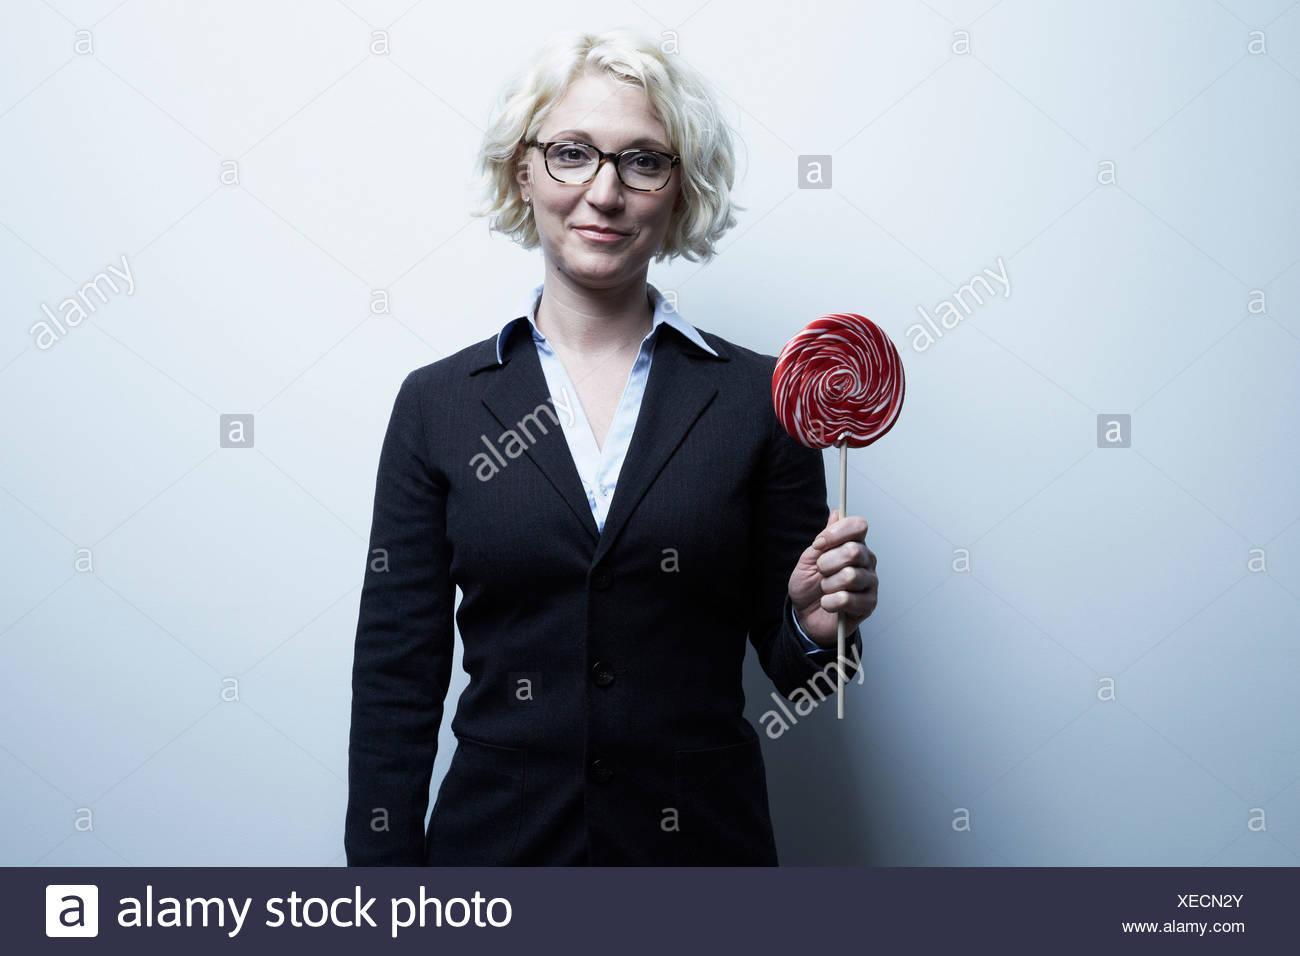 Studio portrait of blond businesswoman with red lollipop - Stock Image